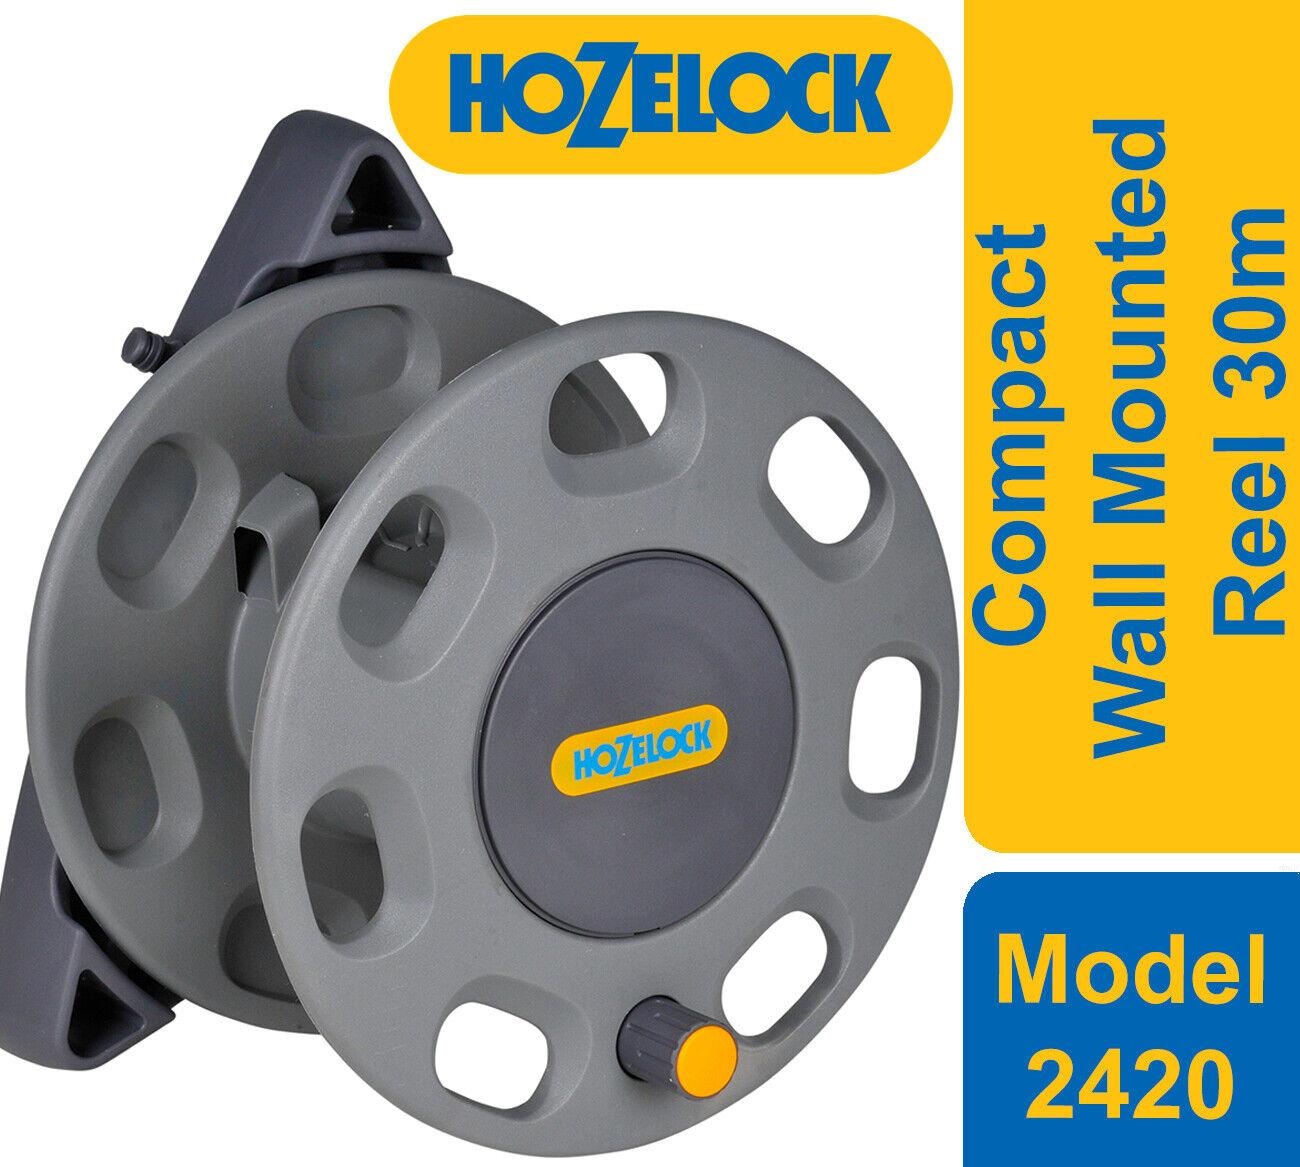 Hozelock 2420 Compact Wall Mounted Reel 30m + Reel Guide